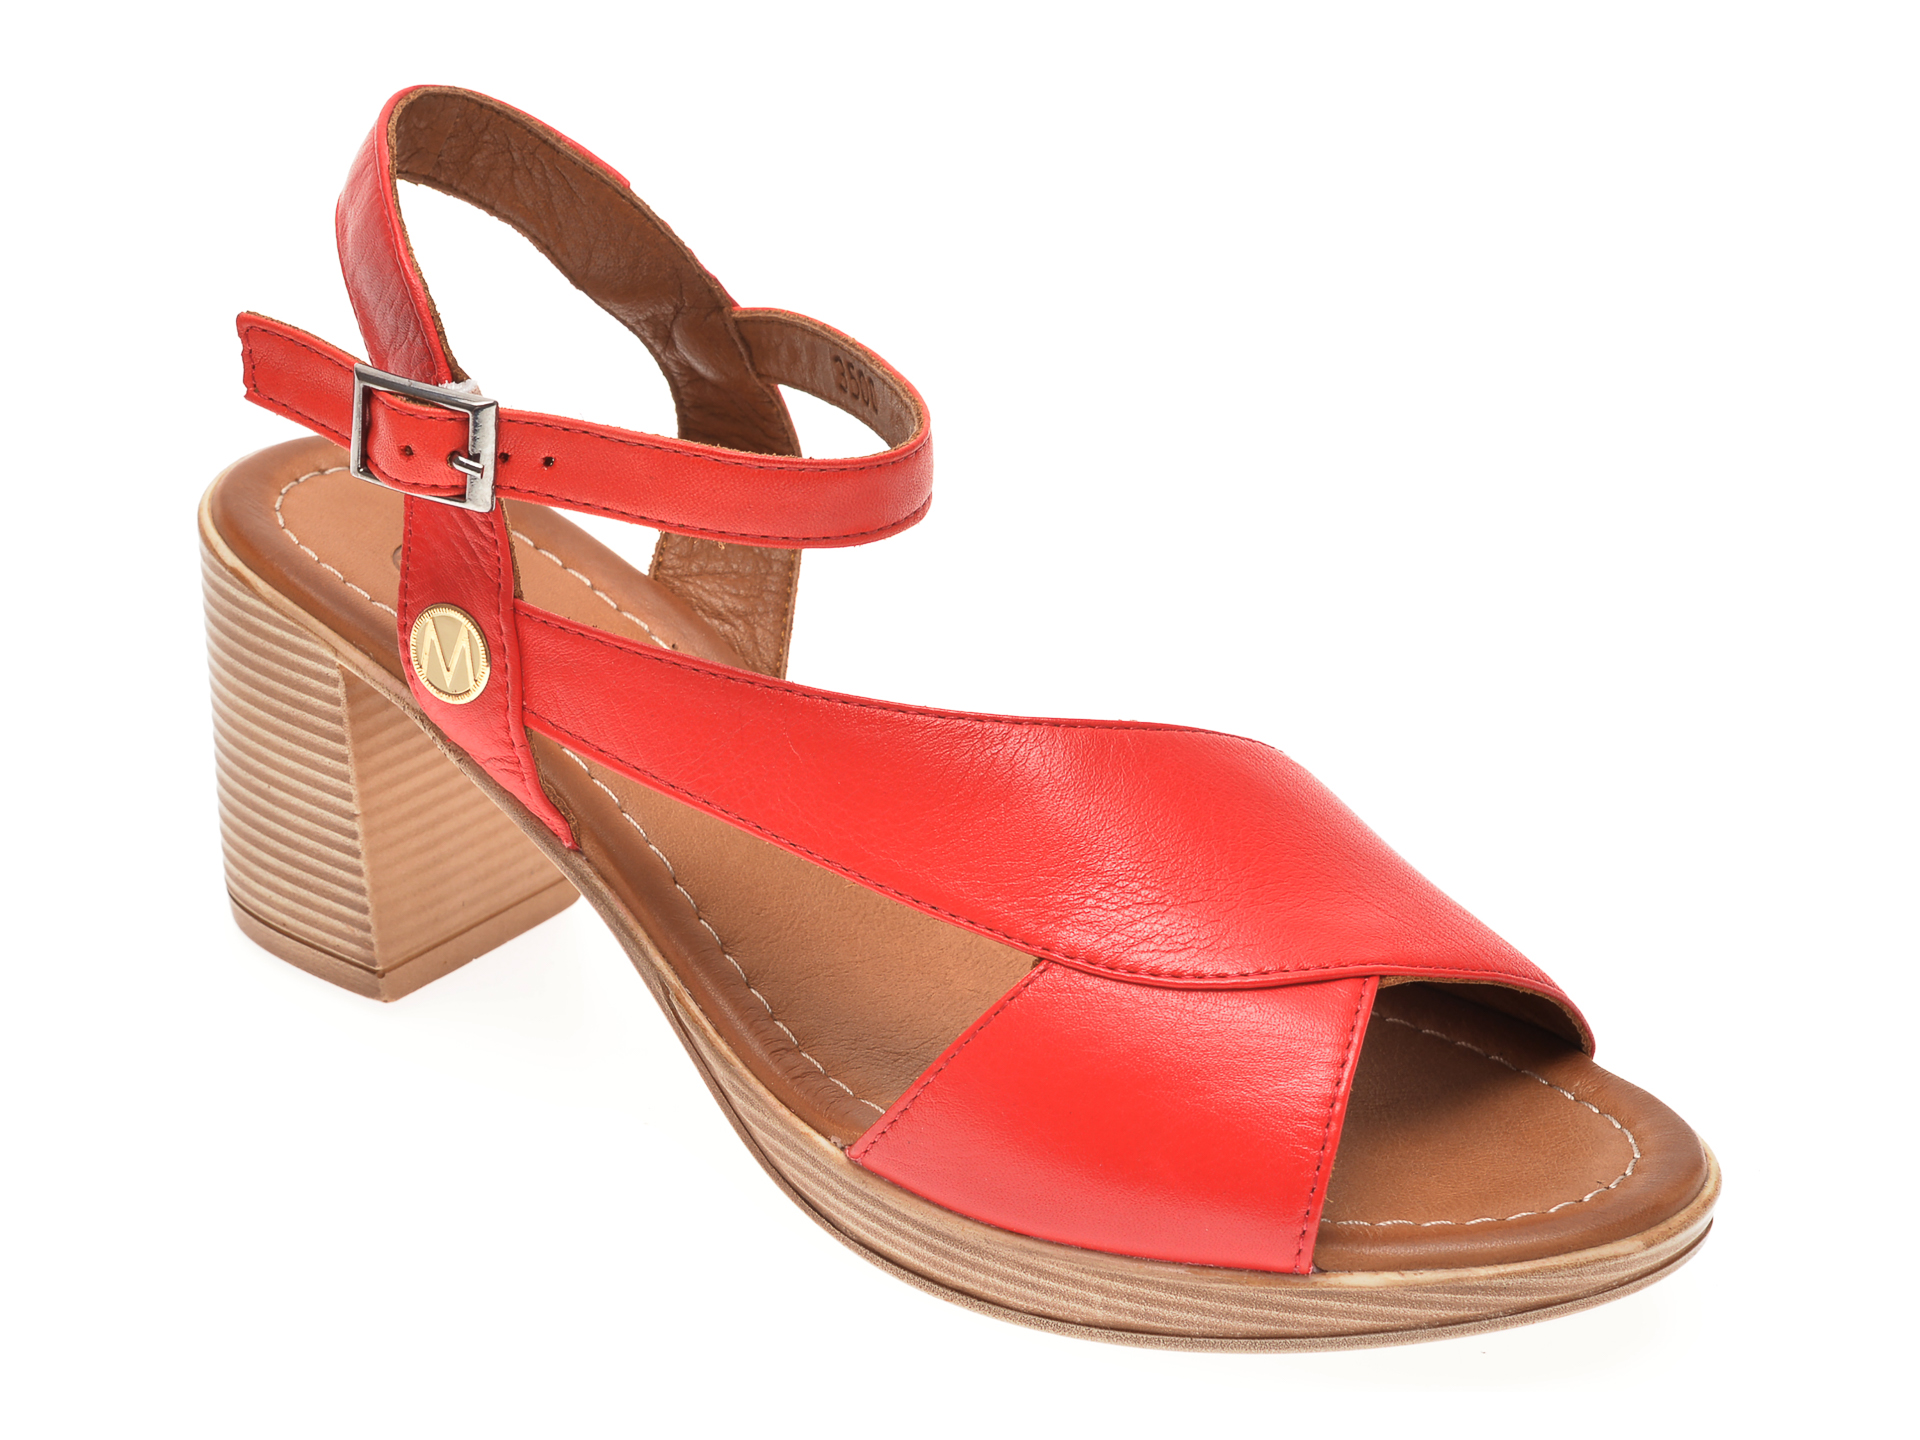 Sandale MESSIMODA rosii, 20Y3500, din piele naturala